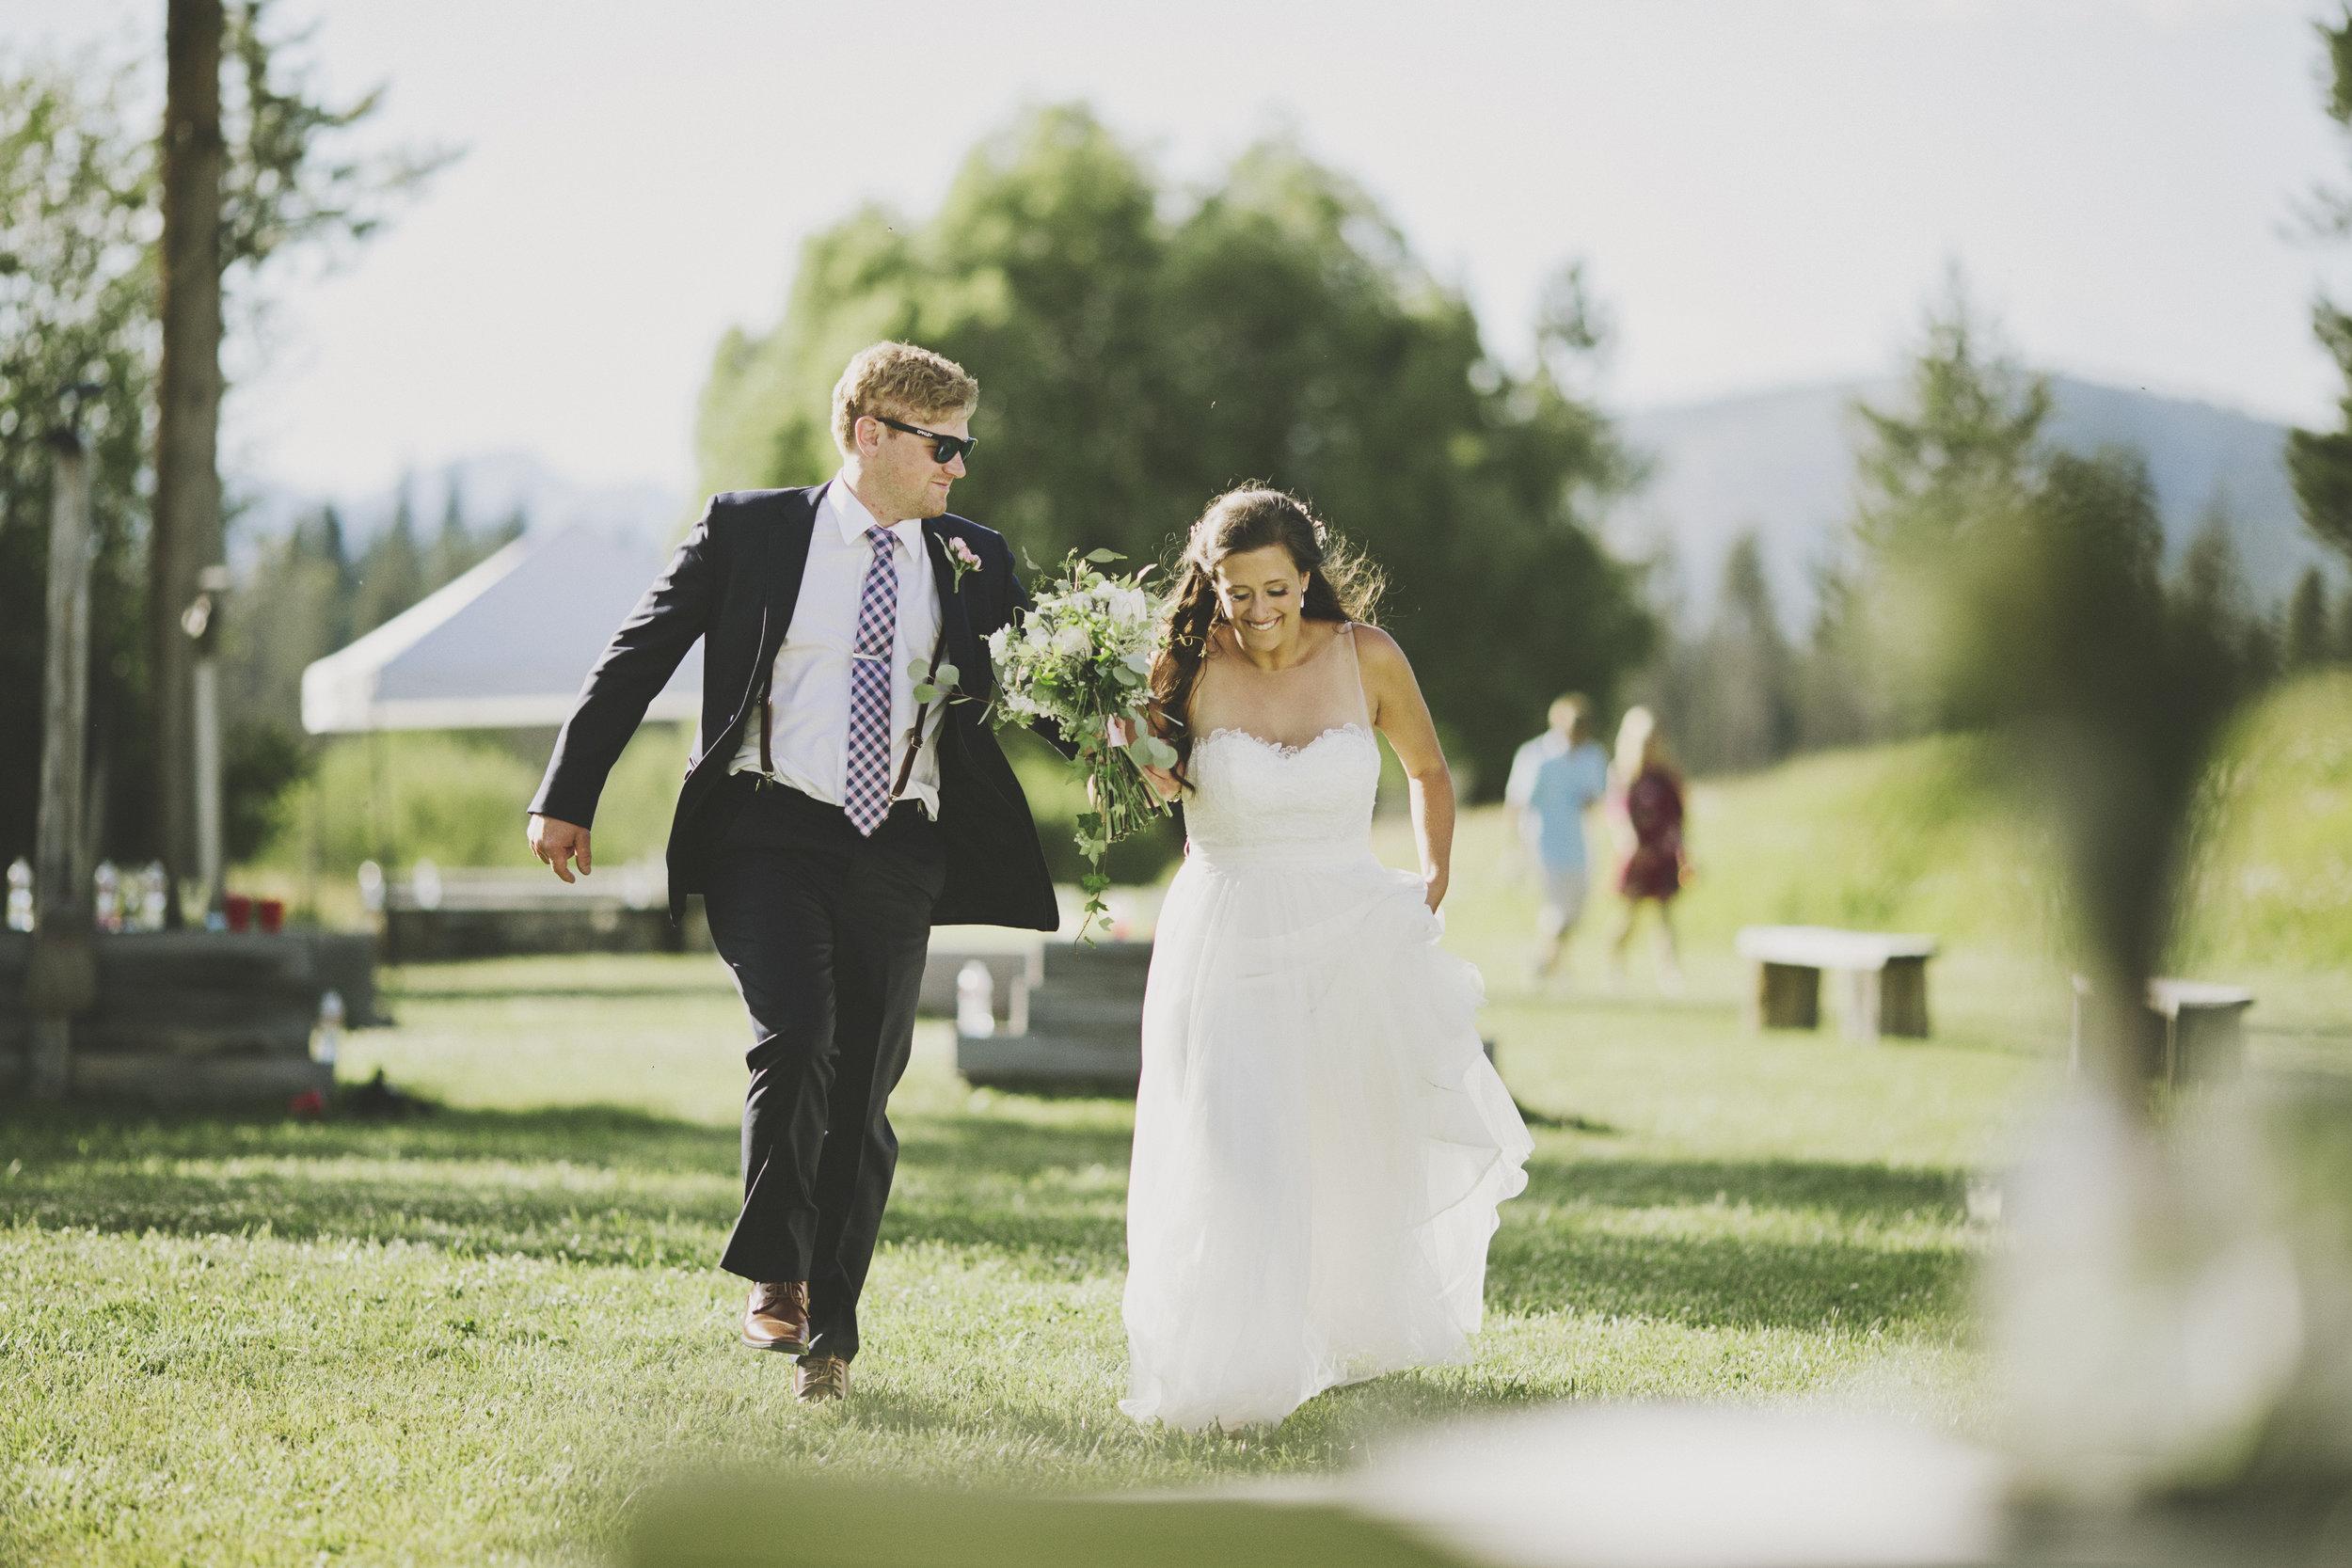 Chloe Hurwitz + Kiefer Martin Wedding_Grey Wolf Ranch_Kelsey Lane Photography5090 copy.jpg